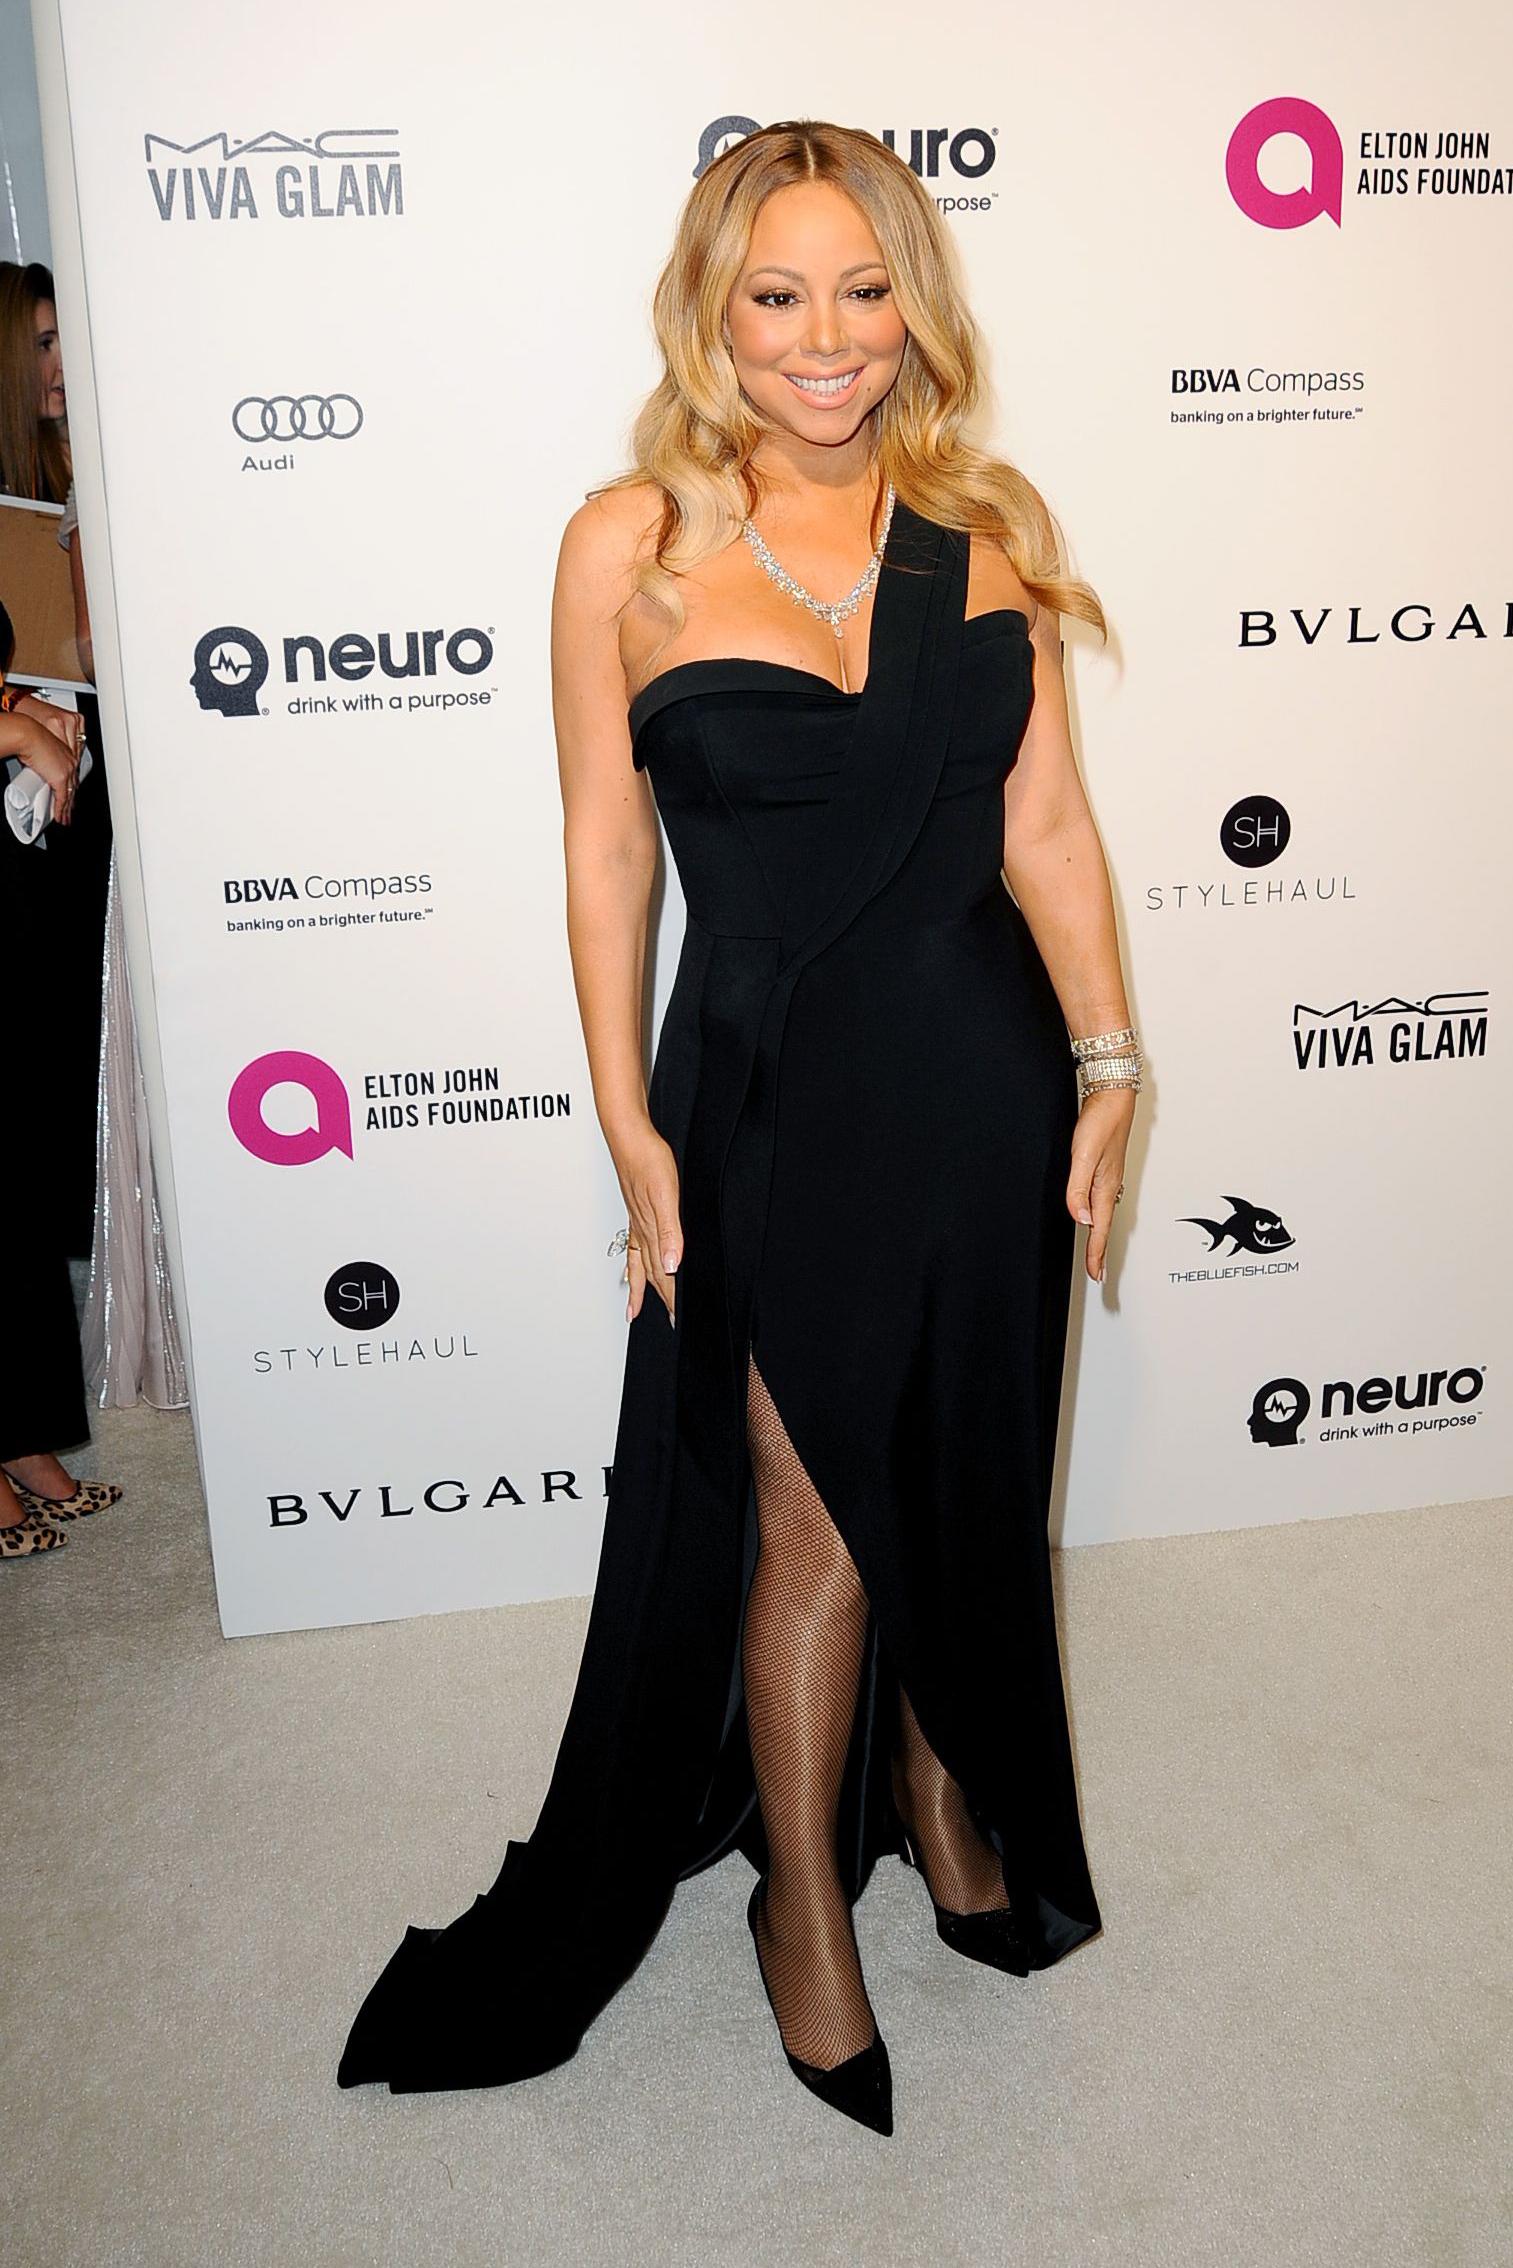 Mariah Carey Elton John AIDS Foundation 2016 Academy Awards Party